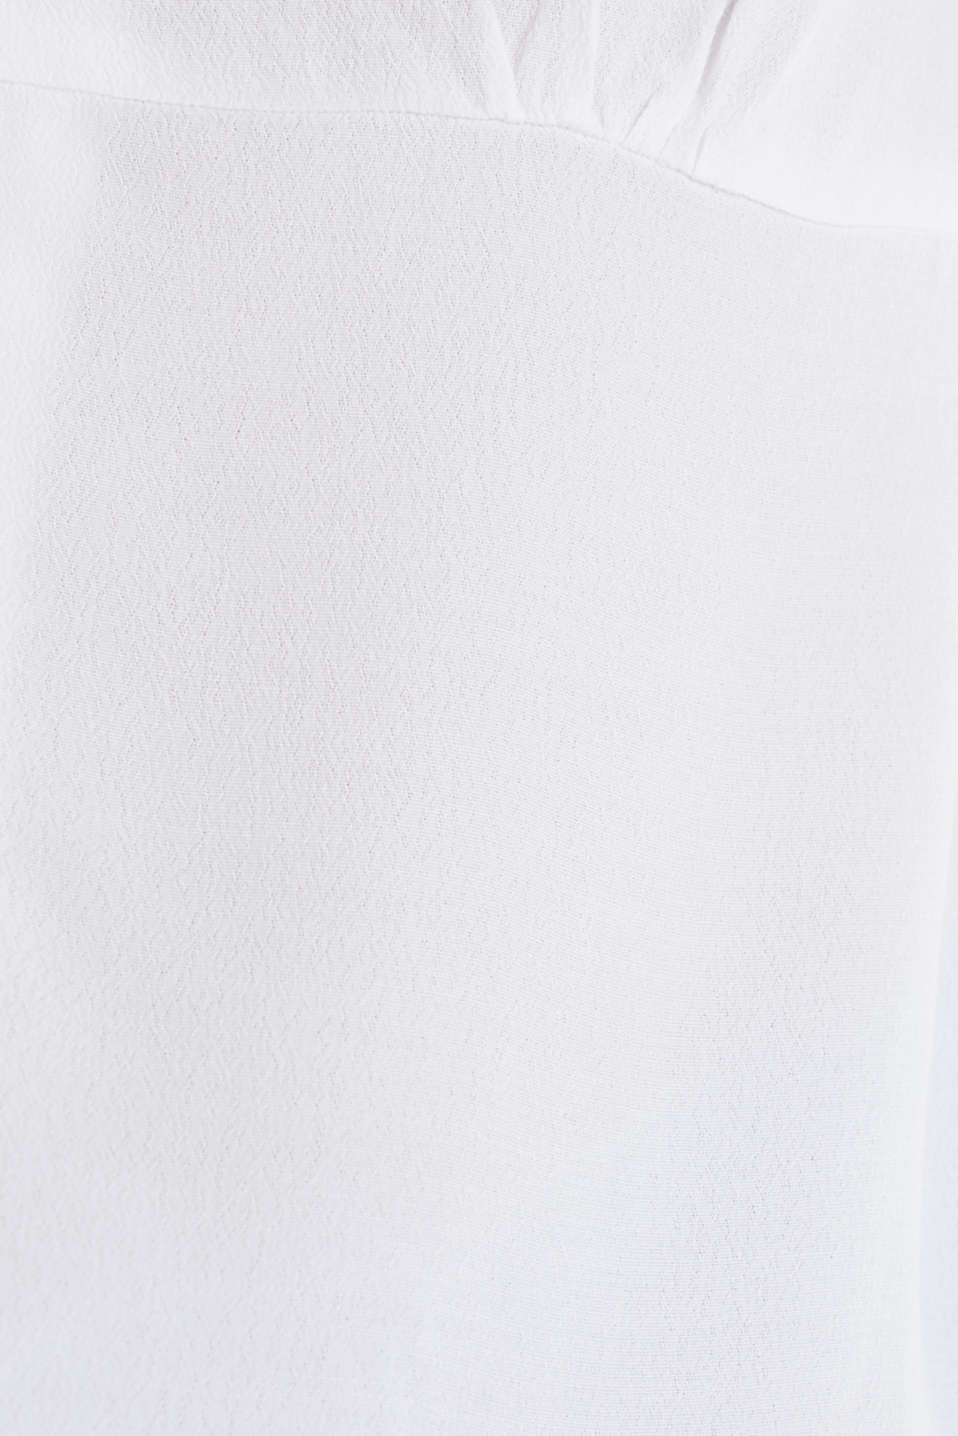 Blouse, LENZING™ ECOVERO™, WHITE, detail image number 3